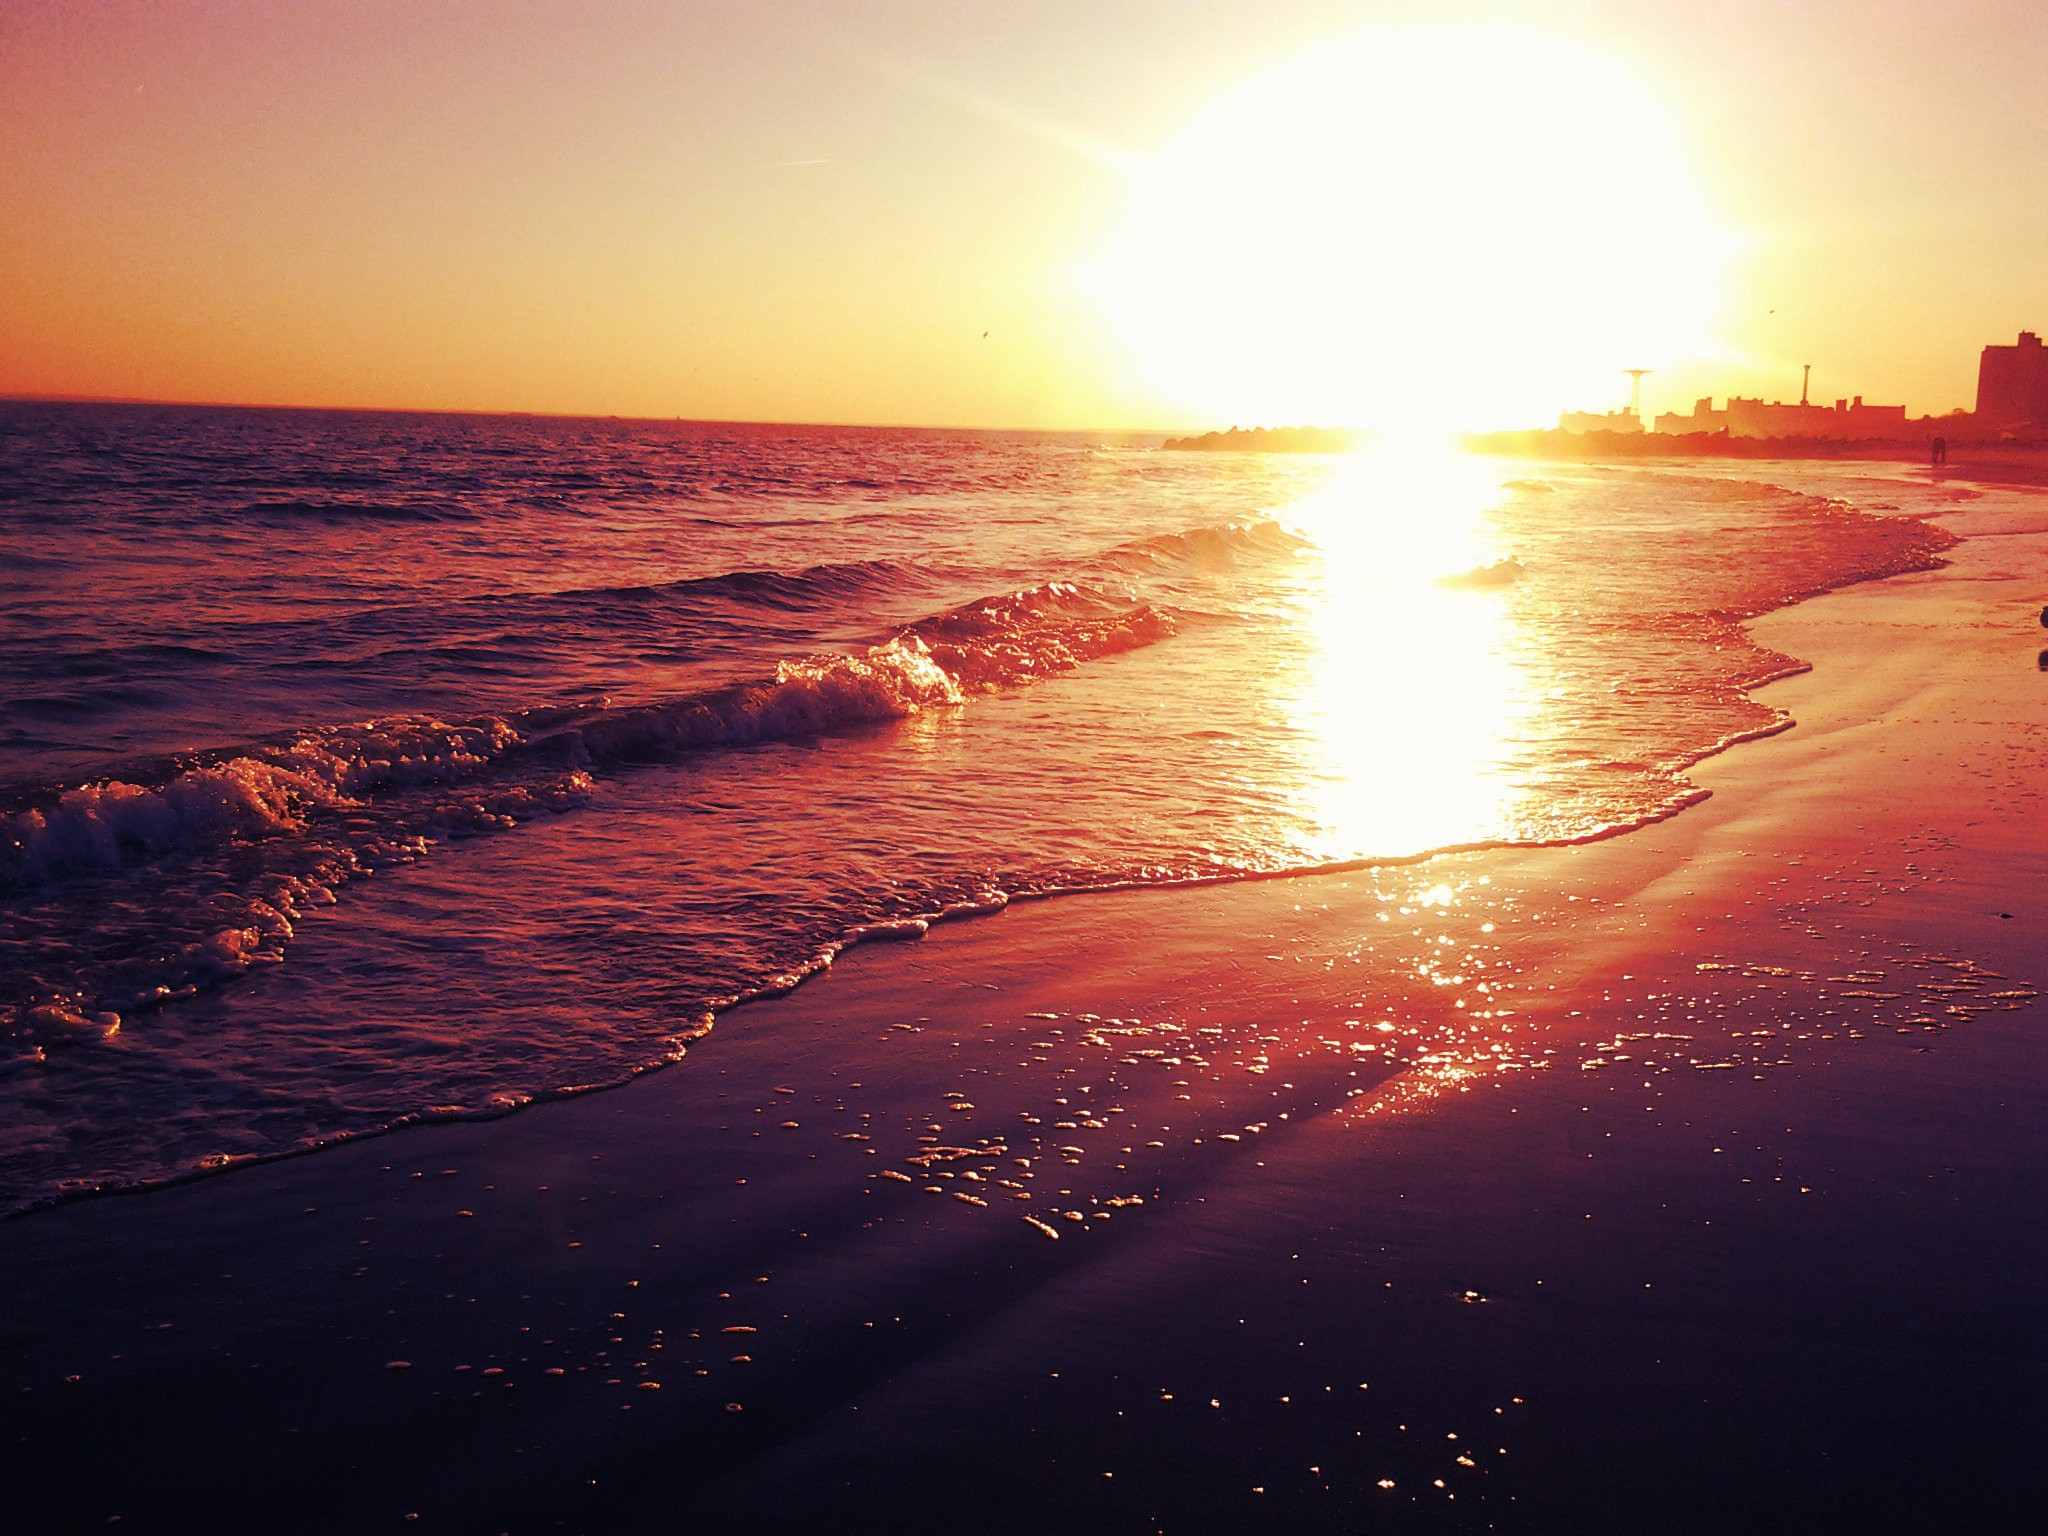 Sunrise Beach Waves Wallpaper